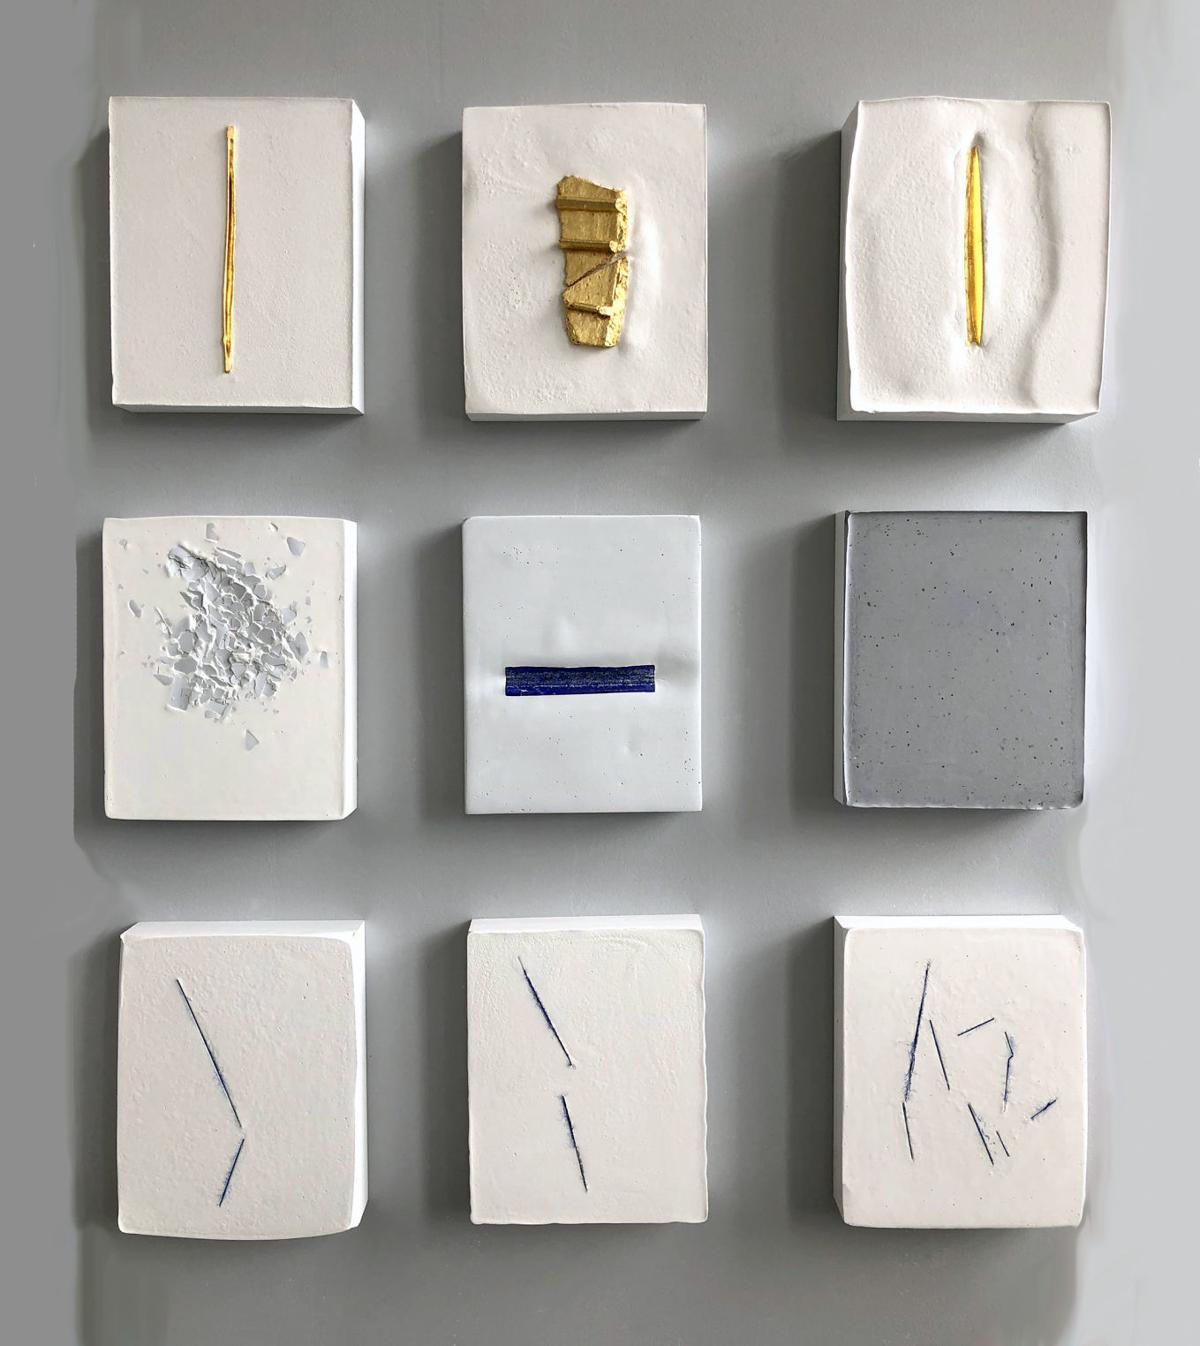 Jill-Downen_PR-1_2019_Bruno-David-Gallery.jpg